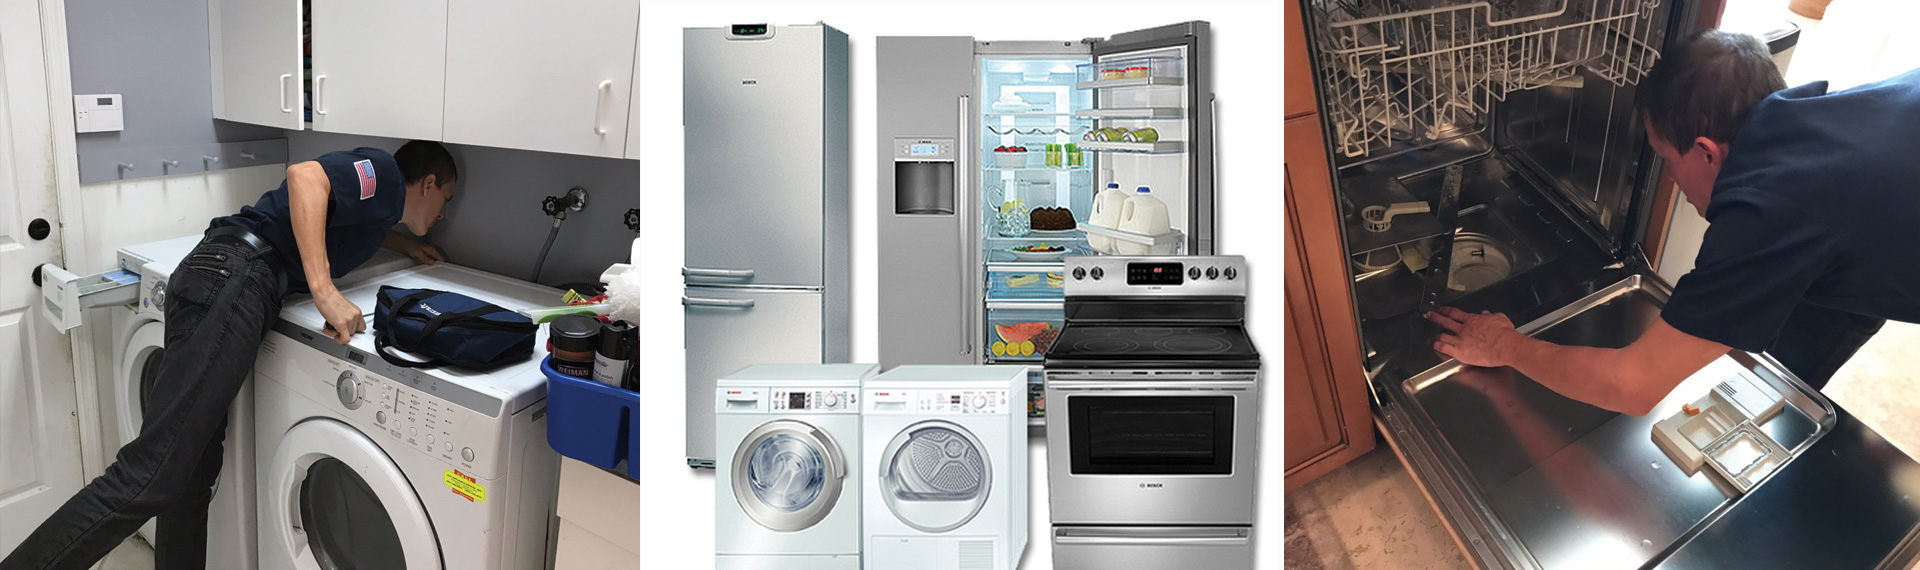 1A Appliance Service Delray Beach FL